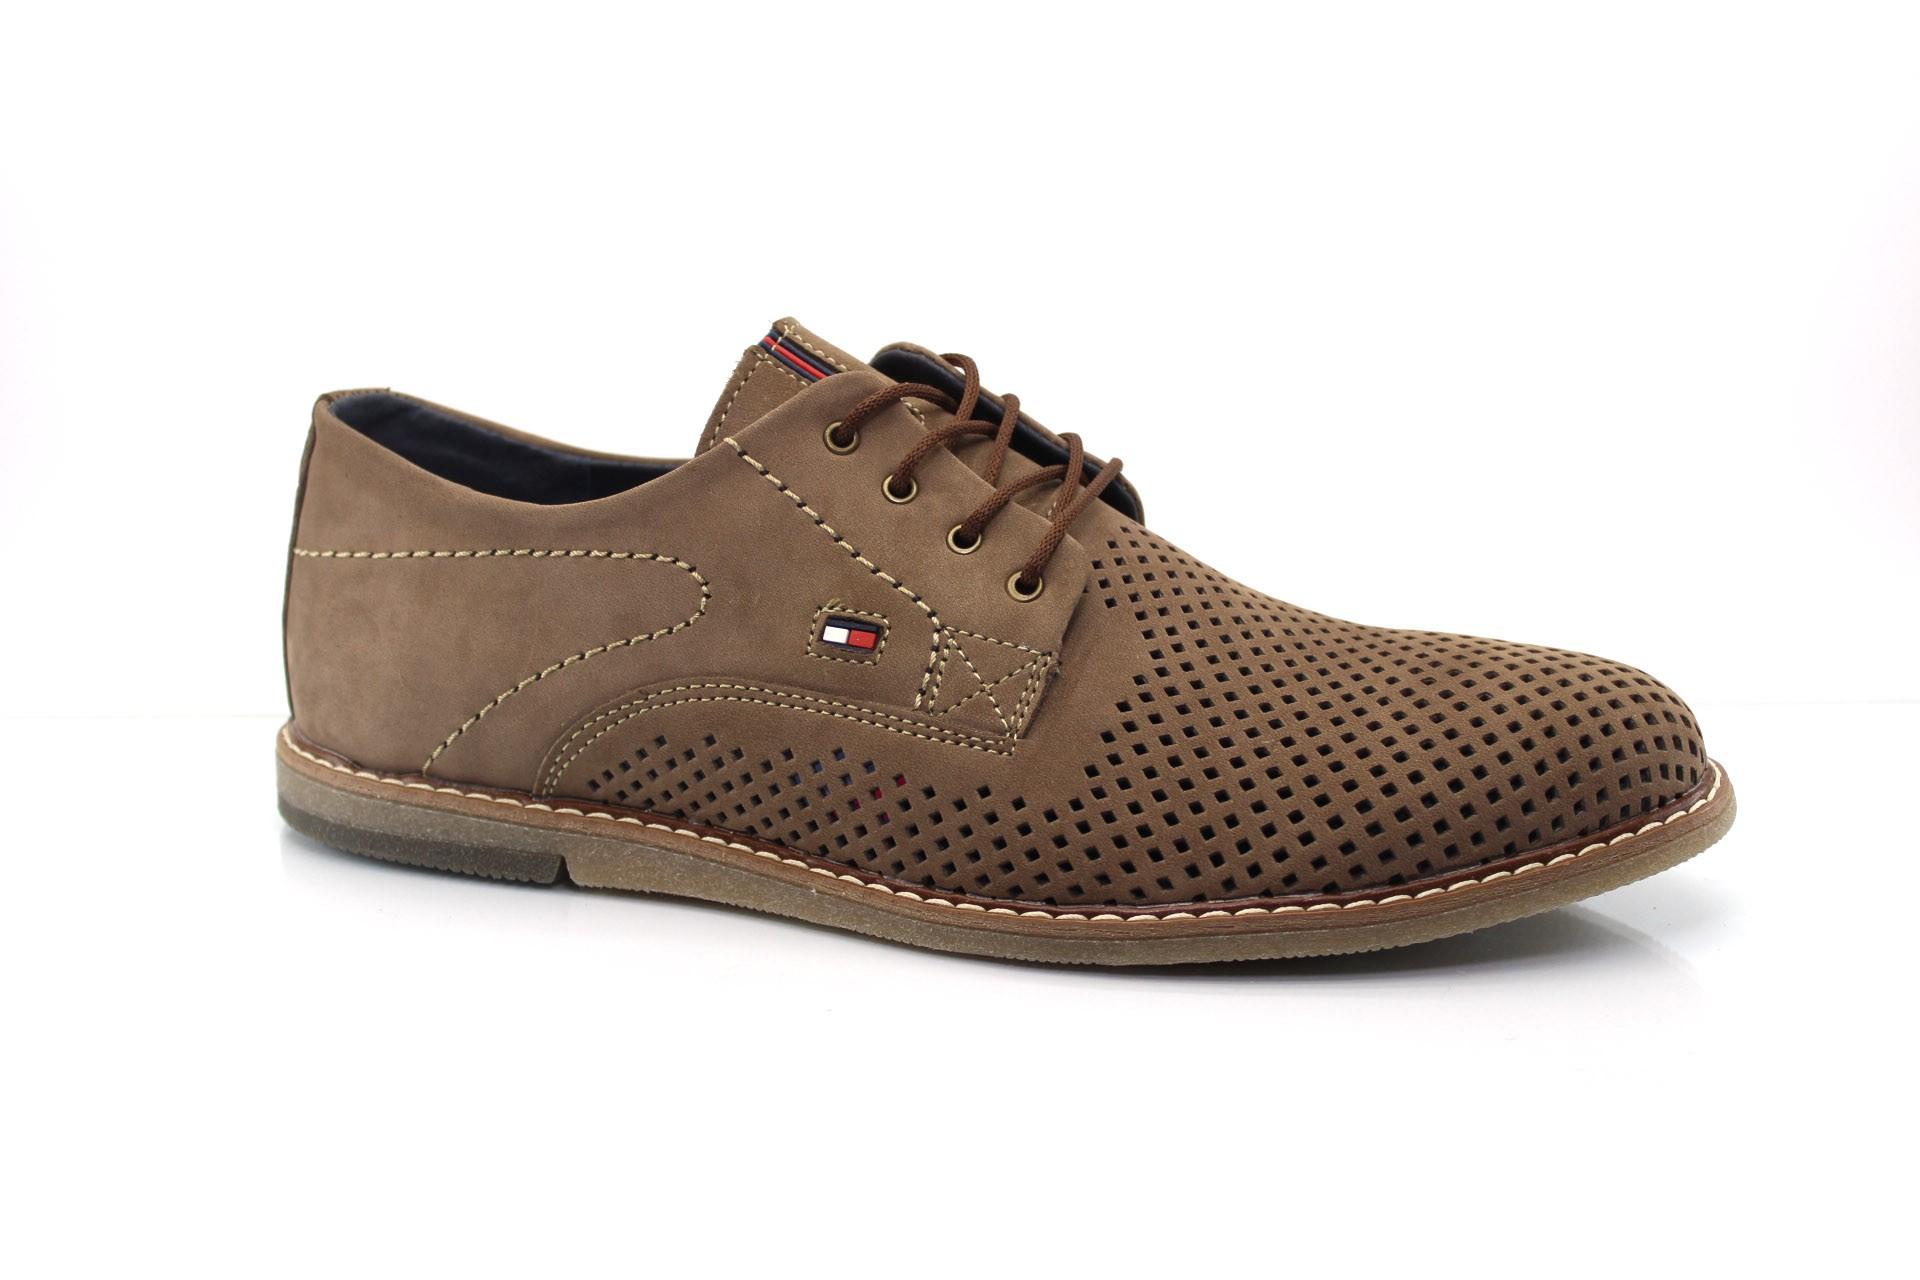 Мужские туфли Multi Shoes Сильвер латте перф.